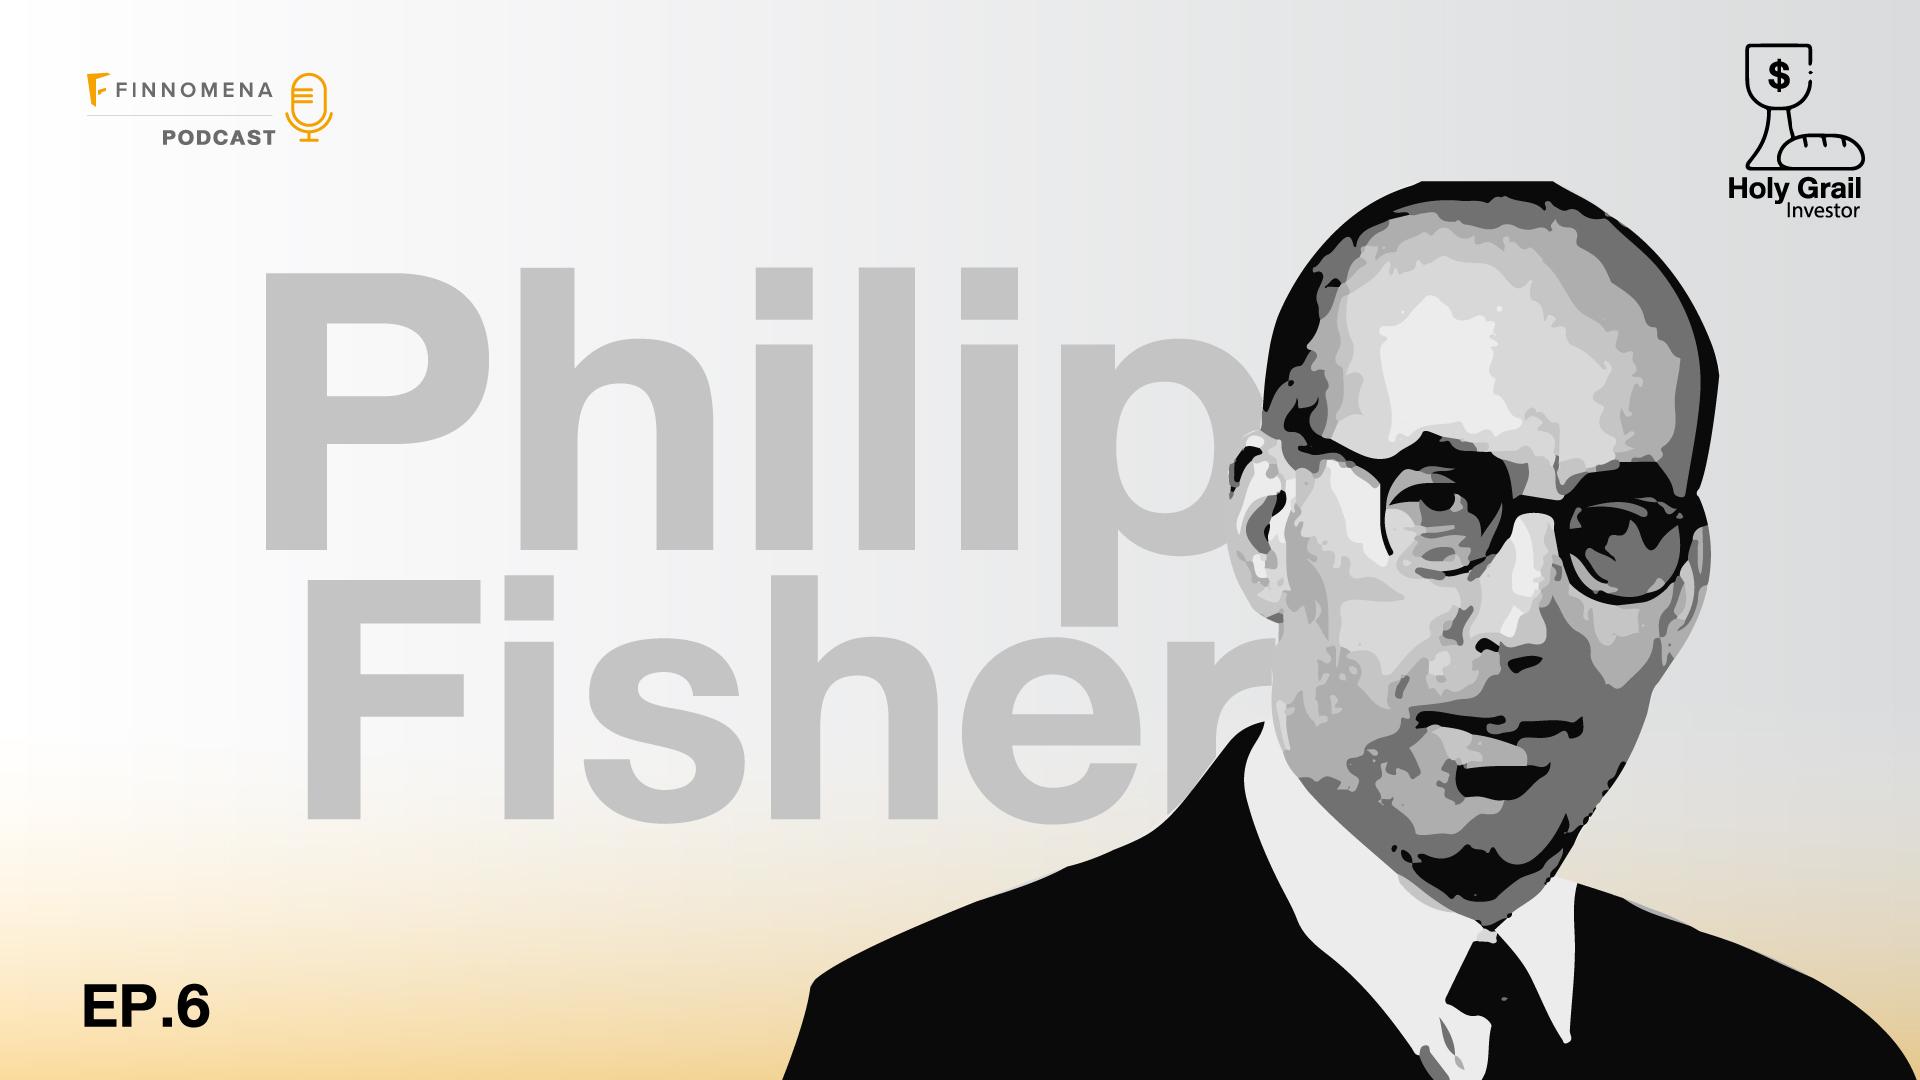 Holy Grail Podcast EP.6: ฟิลลิป ฟิชเชอร์ ทำไมลงทุนทั้งทีต้องรู้ให้ถึงแก่น